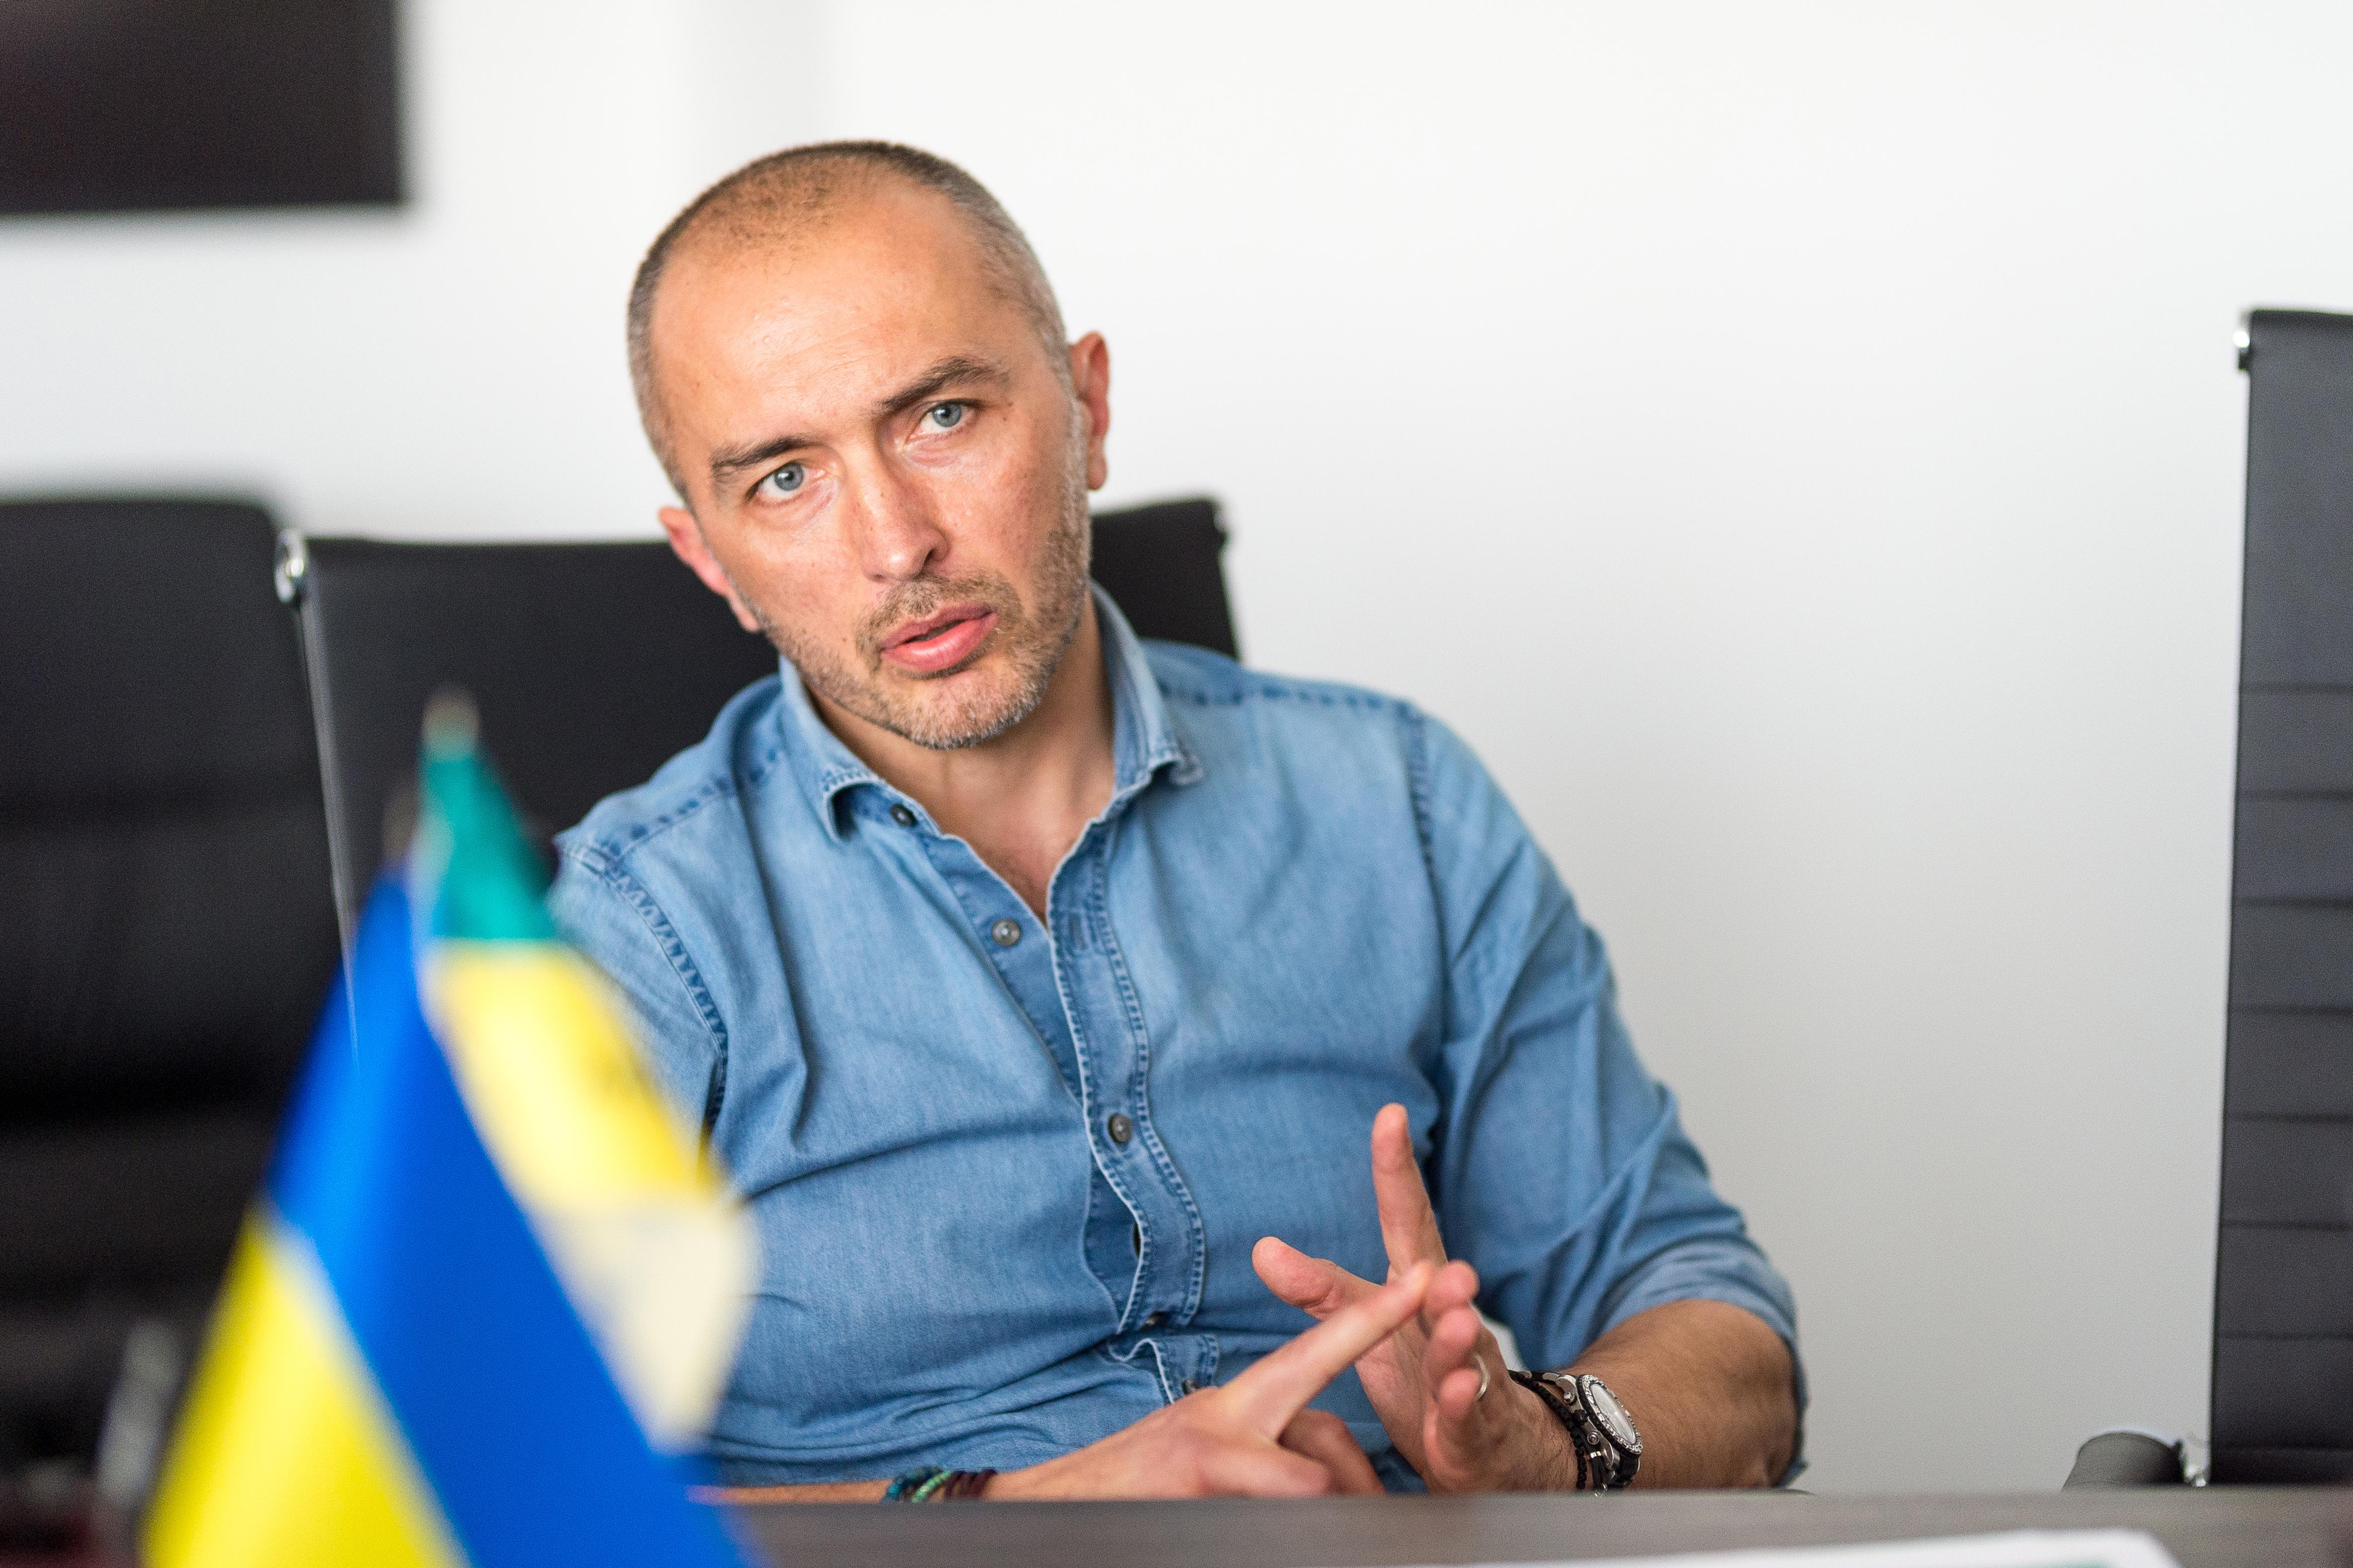 Андрей Пышный, Ощадбанк. Фото: Дмитрий Коренев